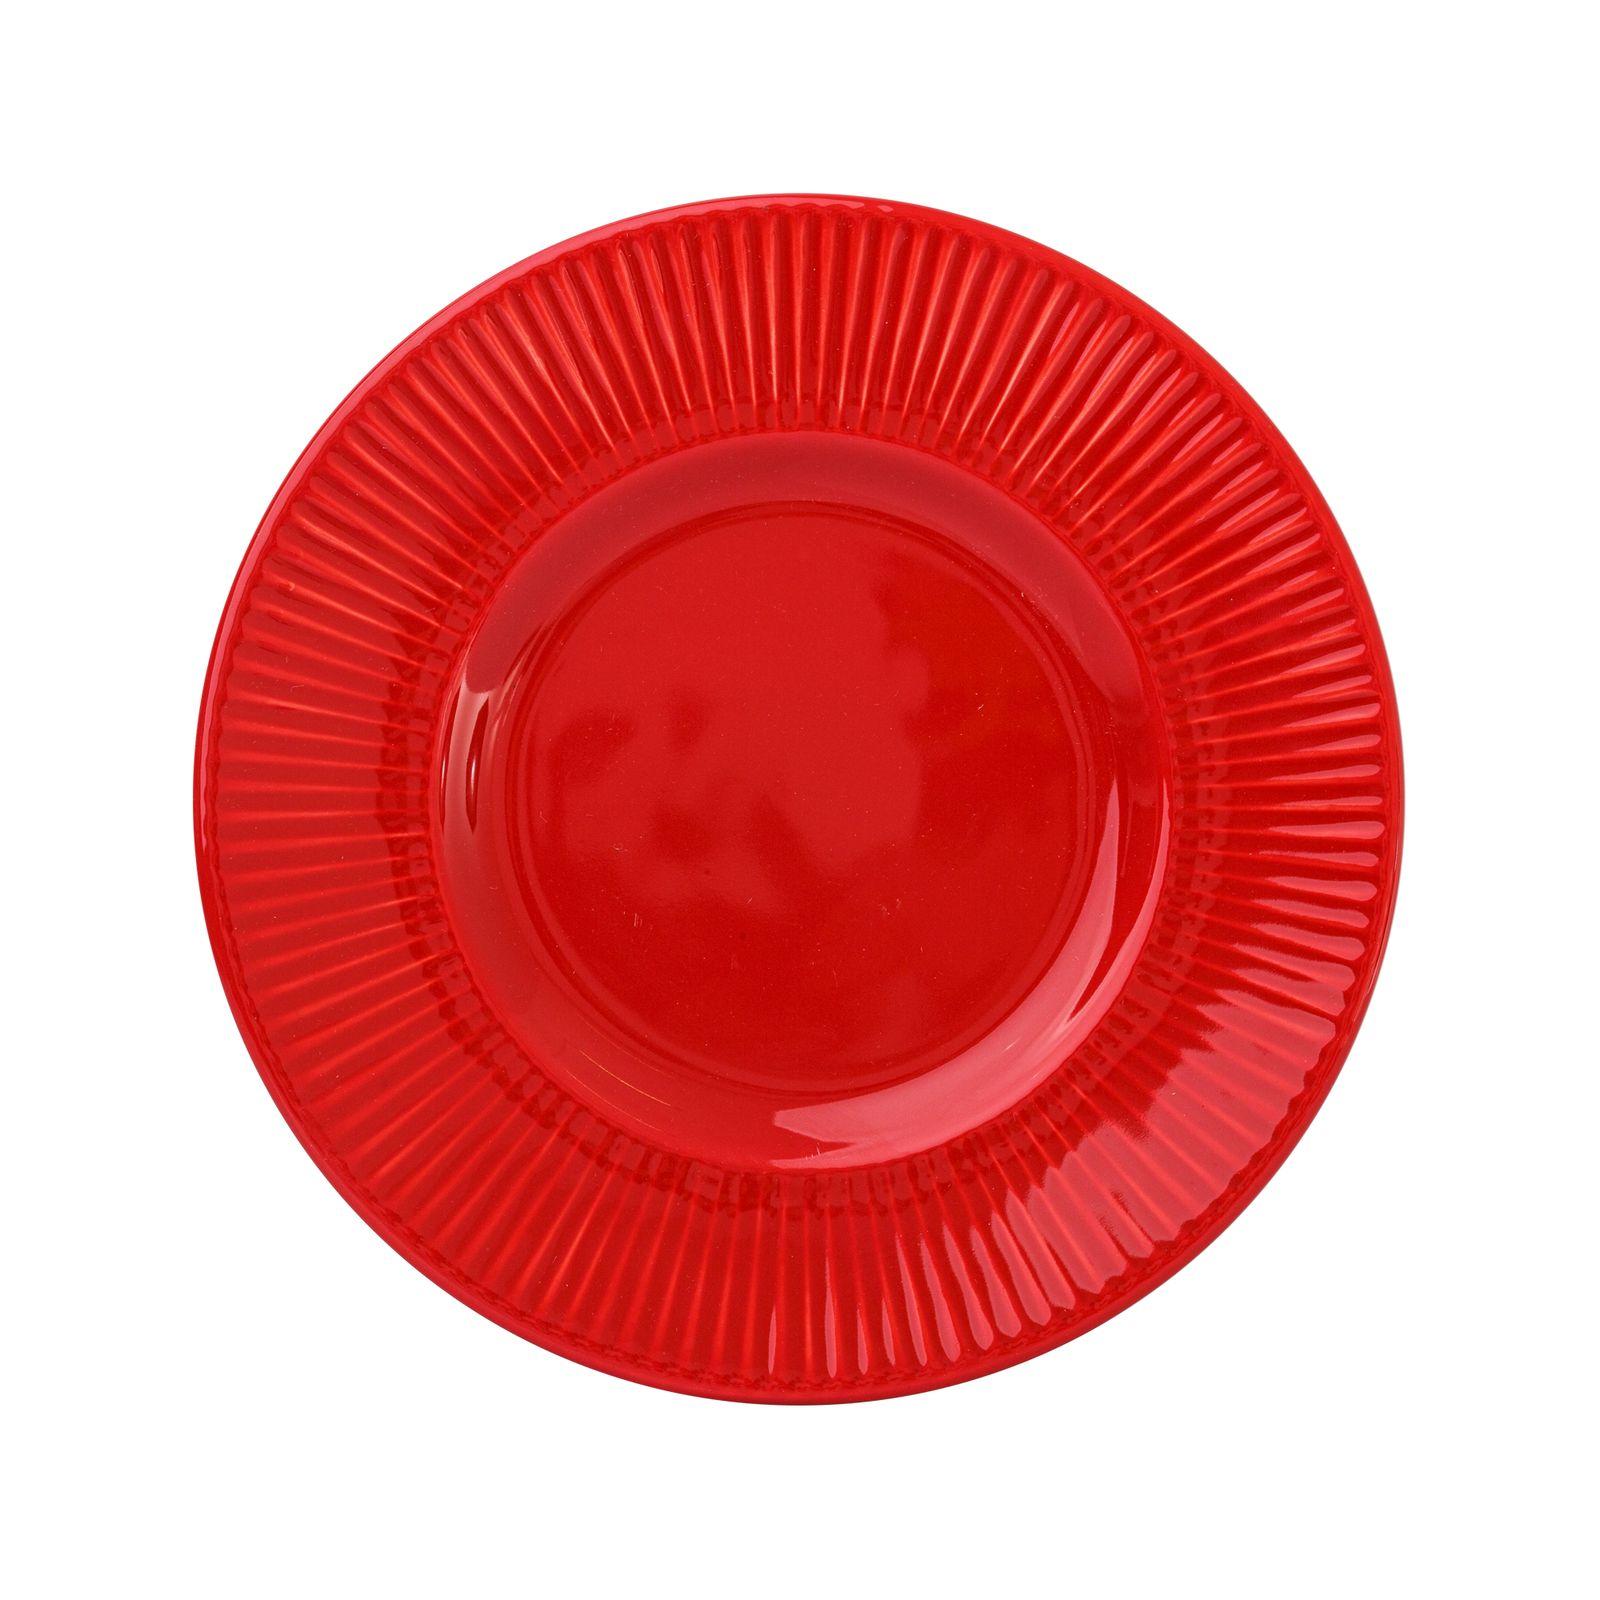 Dessert plate Palette 22.5 cm AMBITION Vivid red